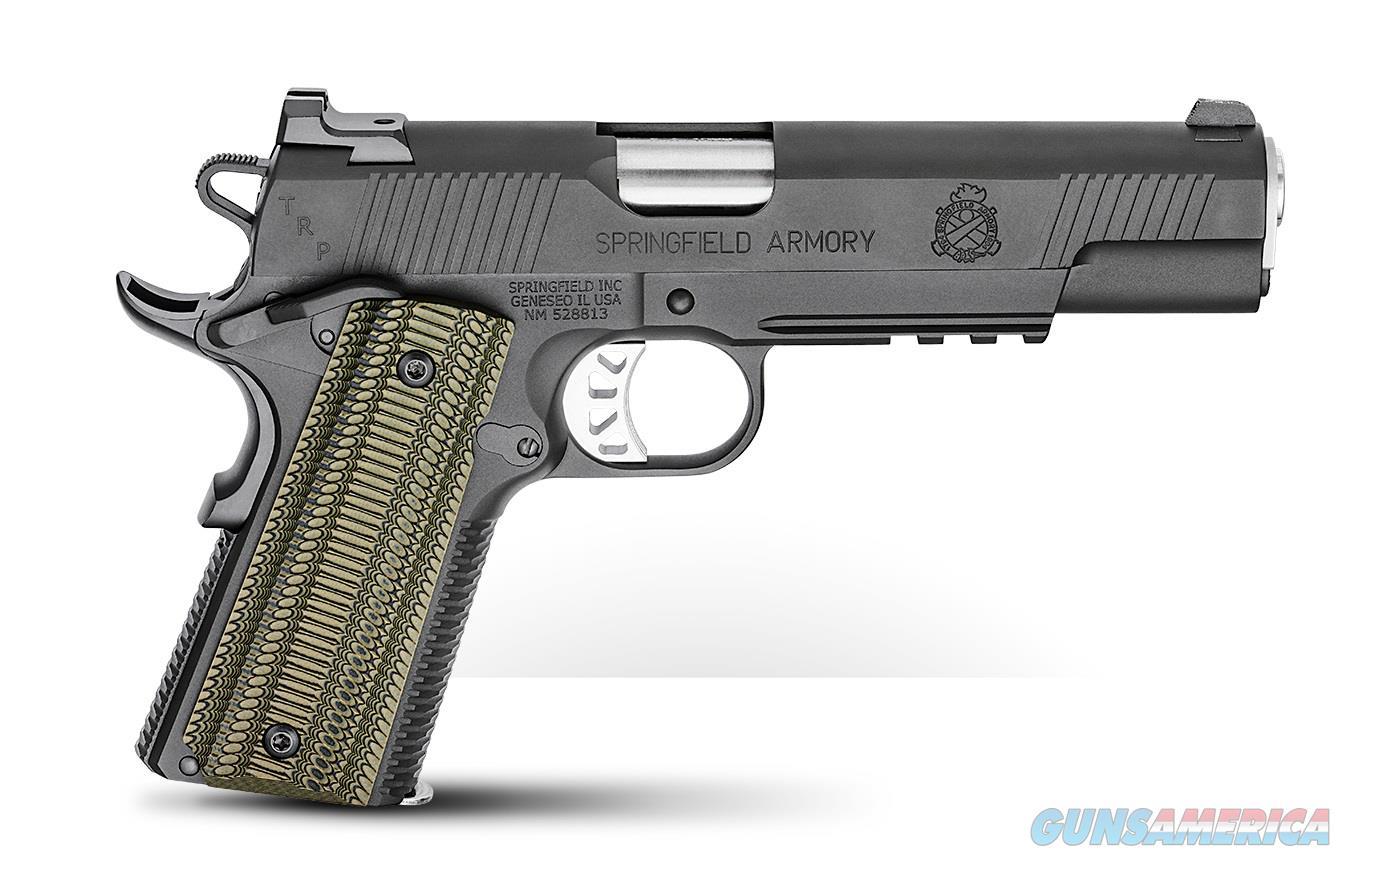 Springfield 1911 TRP Operator 10mm NS Rail PC9510L18 *NEW*  Guns > Pistols > Springfield Armory Pistols > 1911 Type